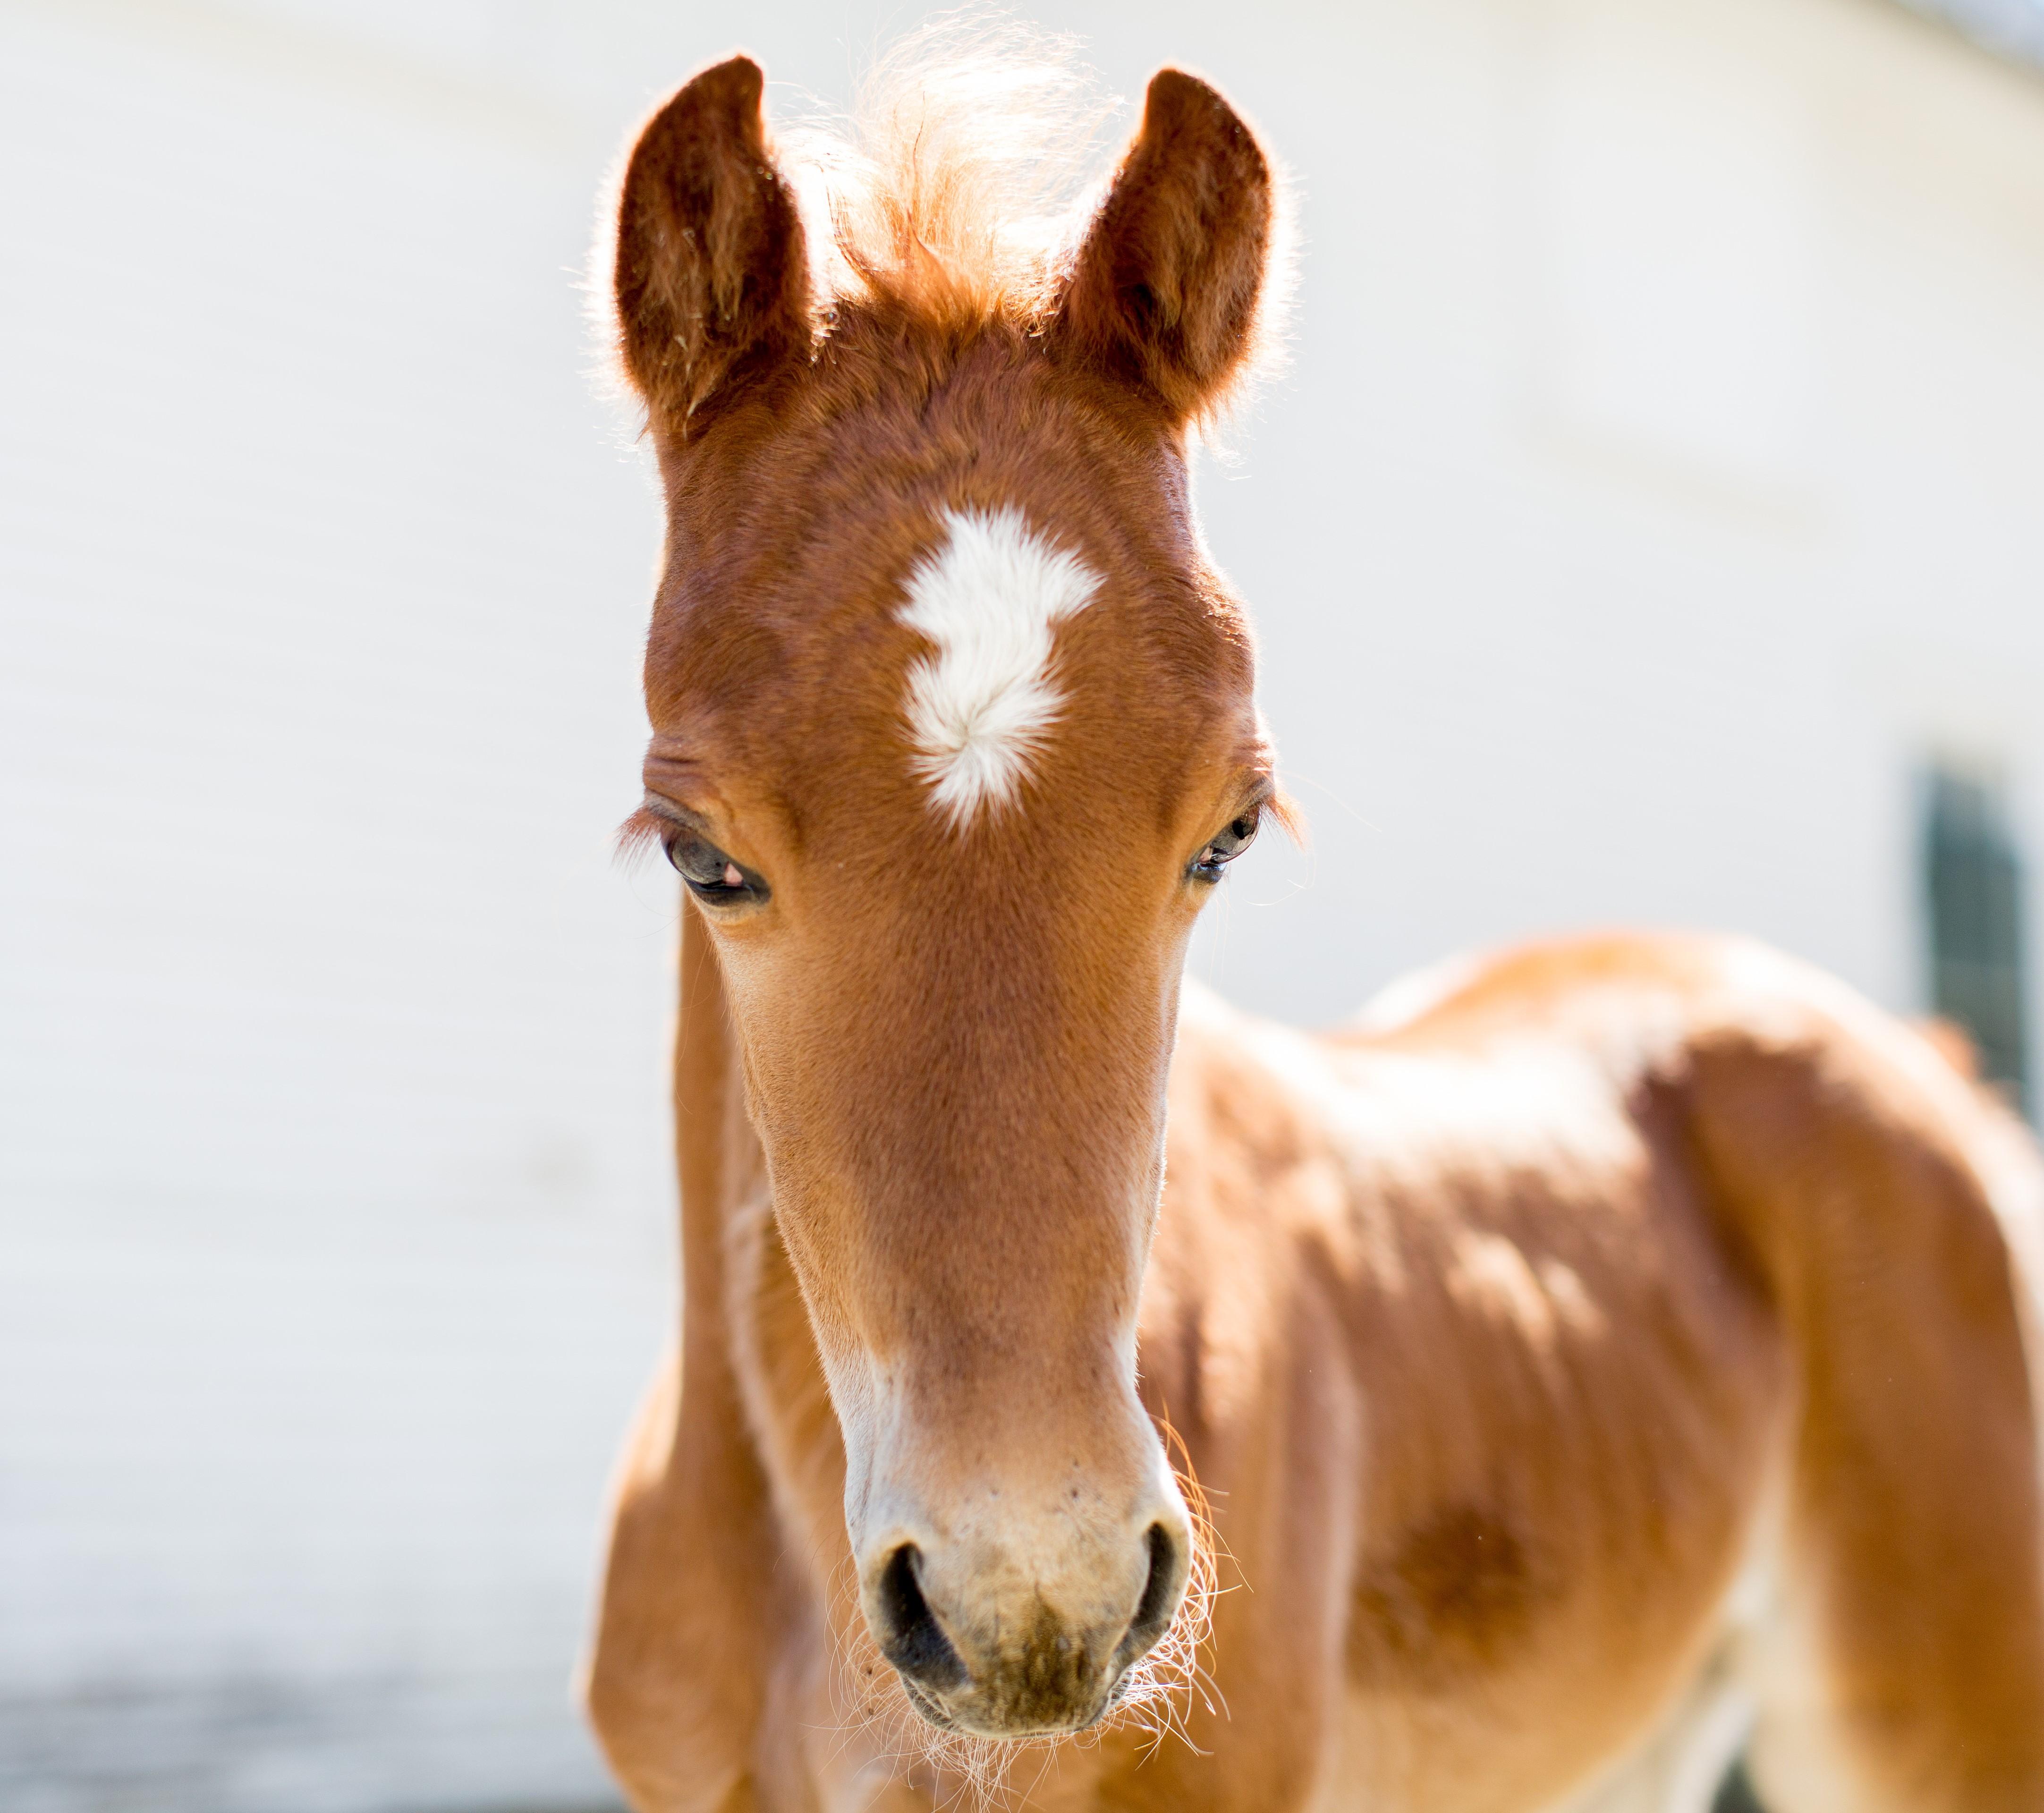 foal headstudy